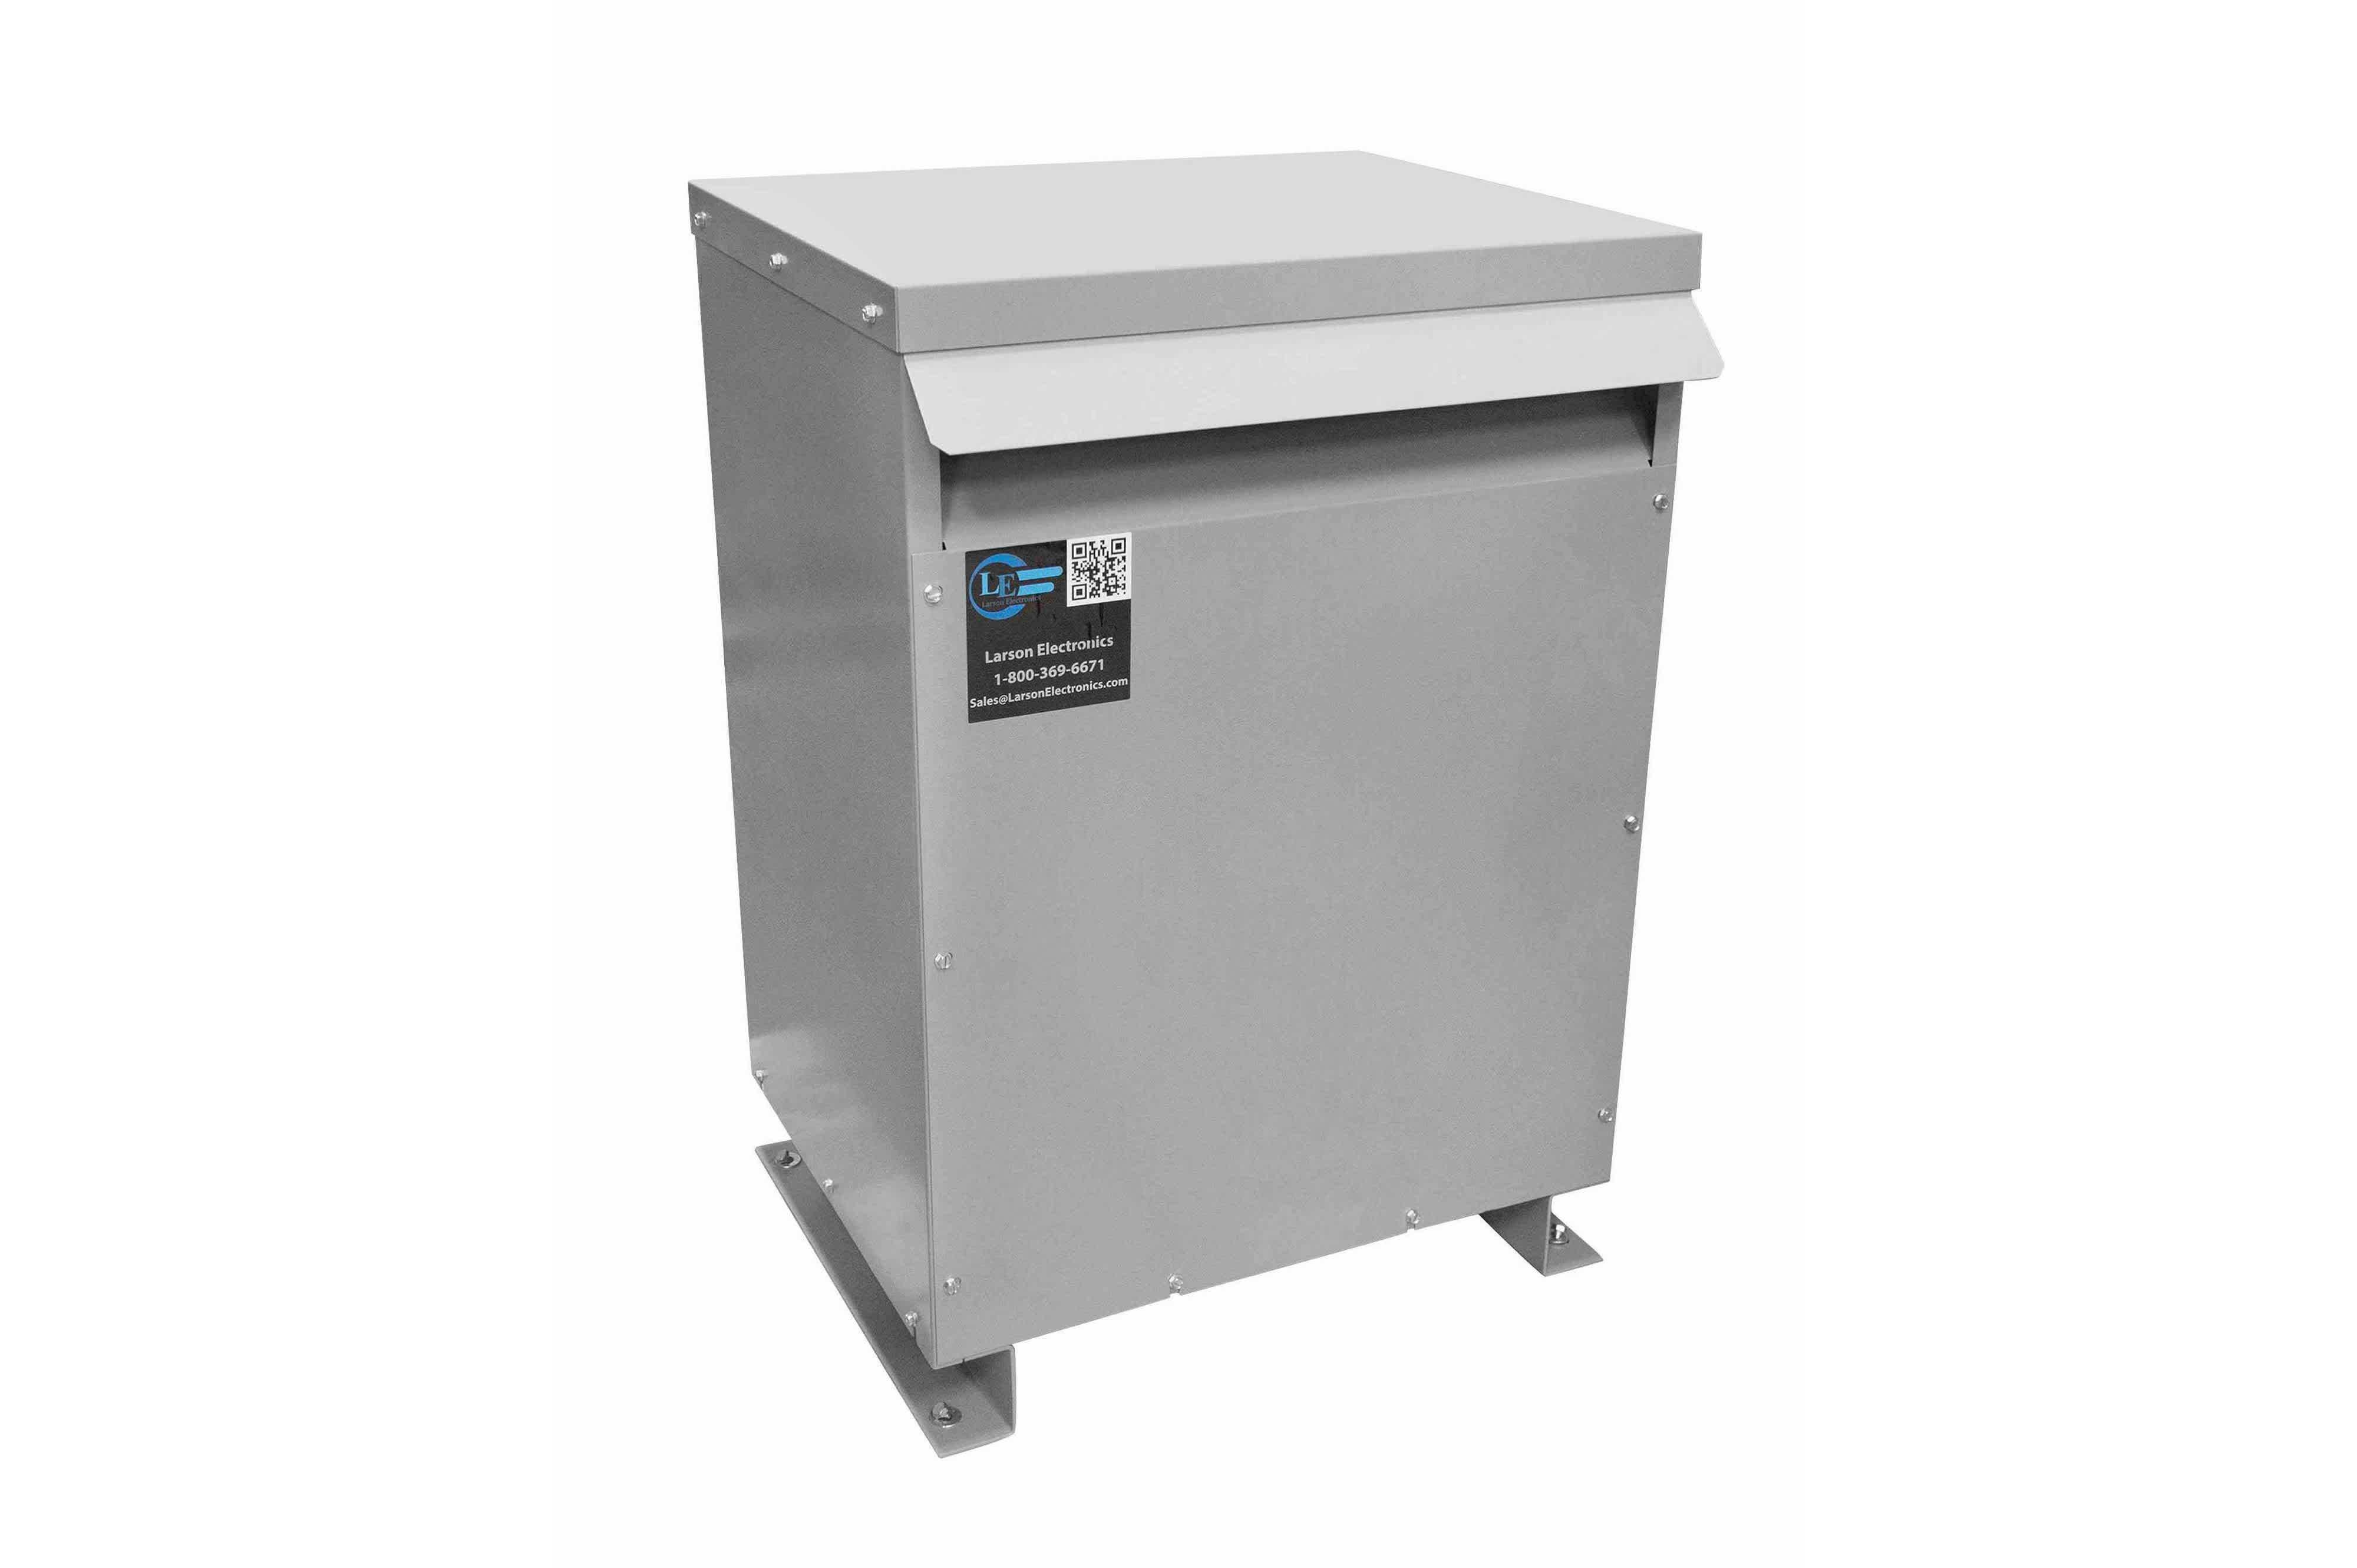 112.5 kVA 3PH Isolation Transformer, 415V Wye Primary, 240V/120 Delta Secondary, N3R, Ventilated, 60 Hz